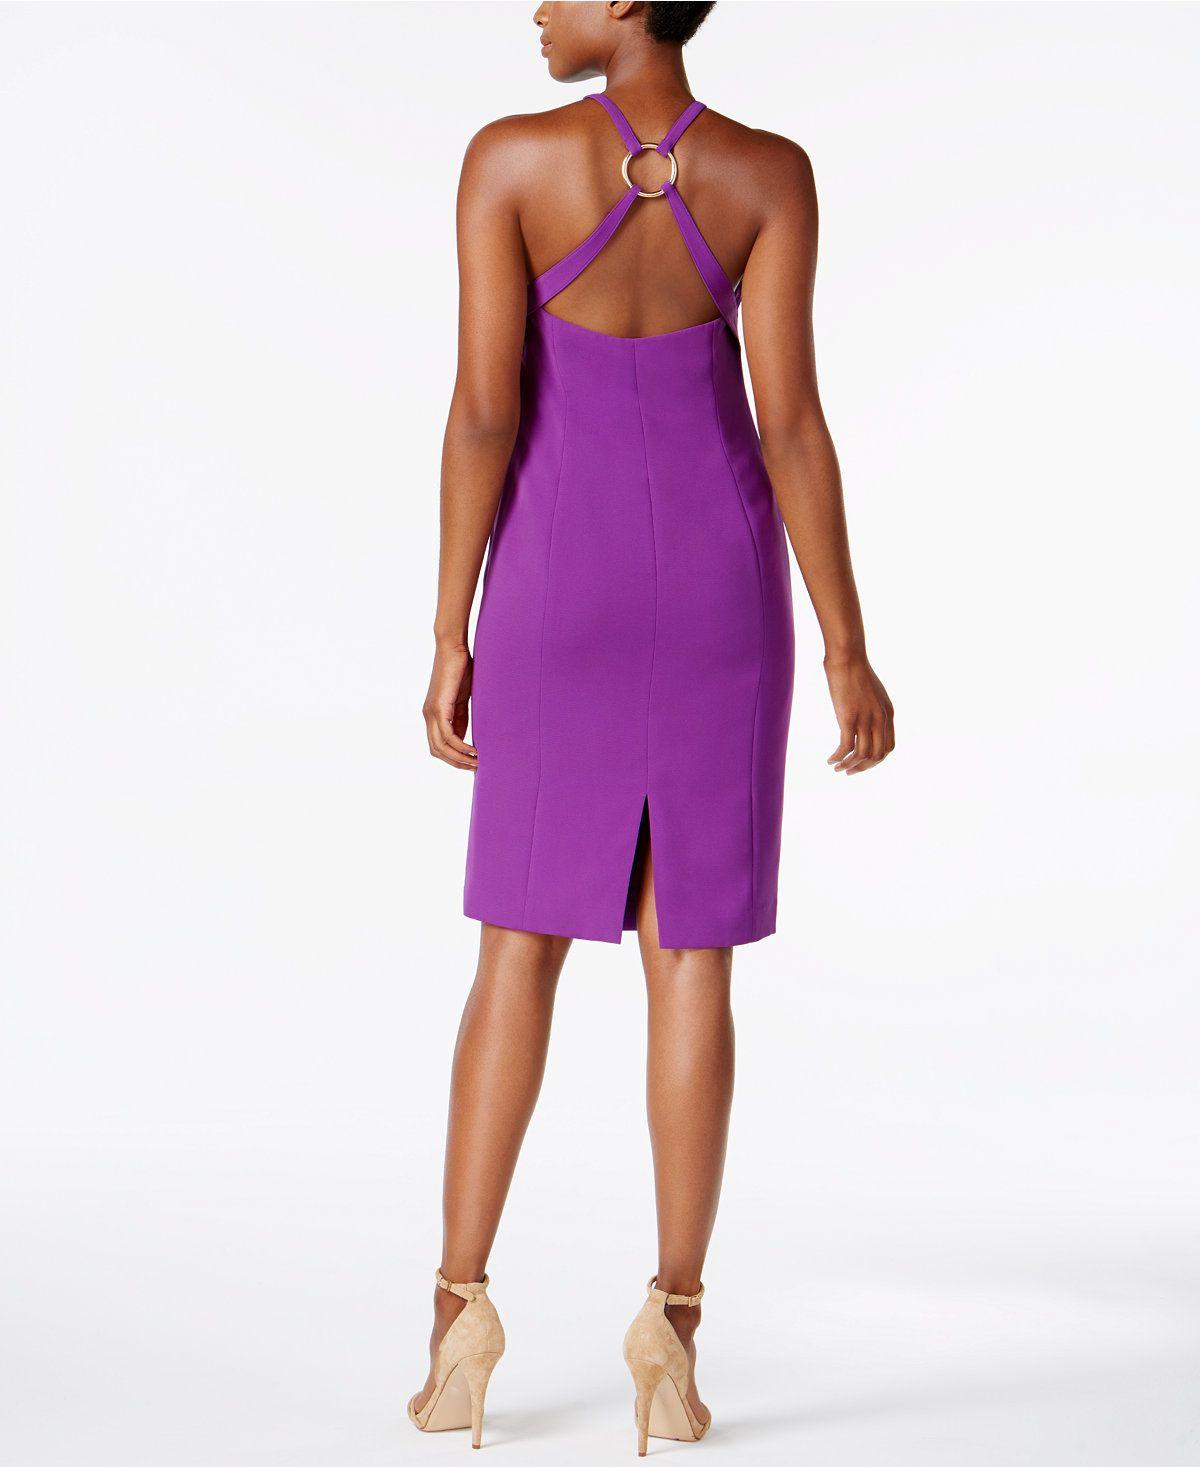 bb4ea0d3494 Calvin Klein Open-Back Crepe Dress - Calvin Klein Dresses - Women - Macy s